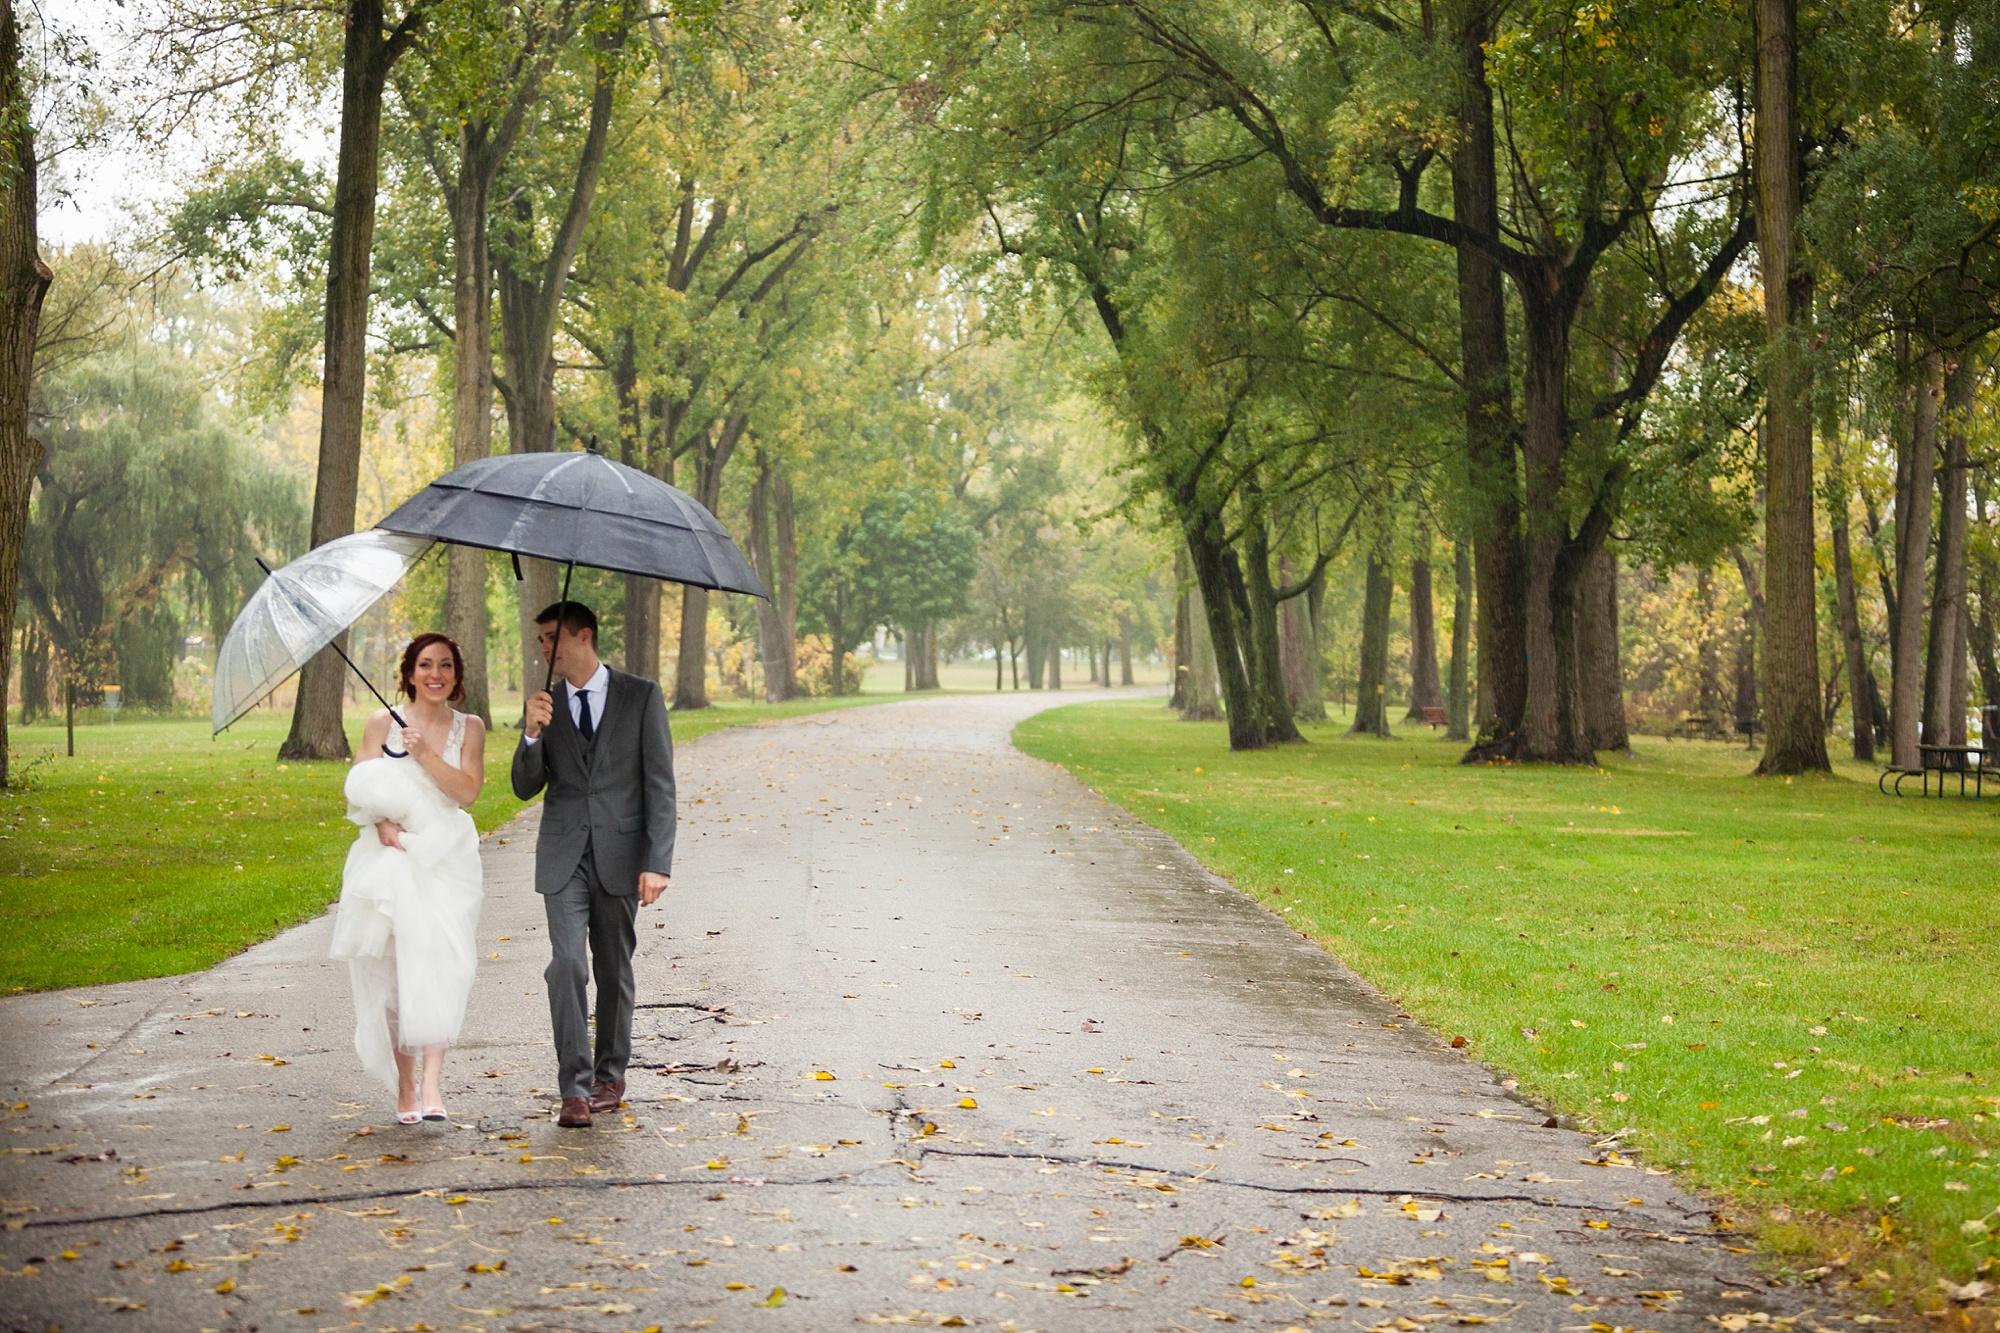 Brandon_Shafer_Photography_Lauren_Ethan_New_Vintage_Place_Grand_Rapids_Wedding_0023.jpg